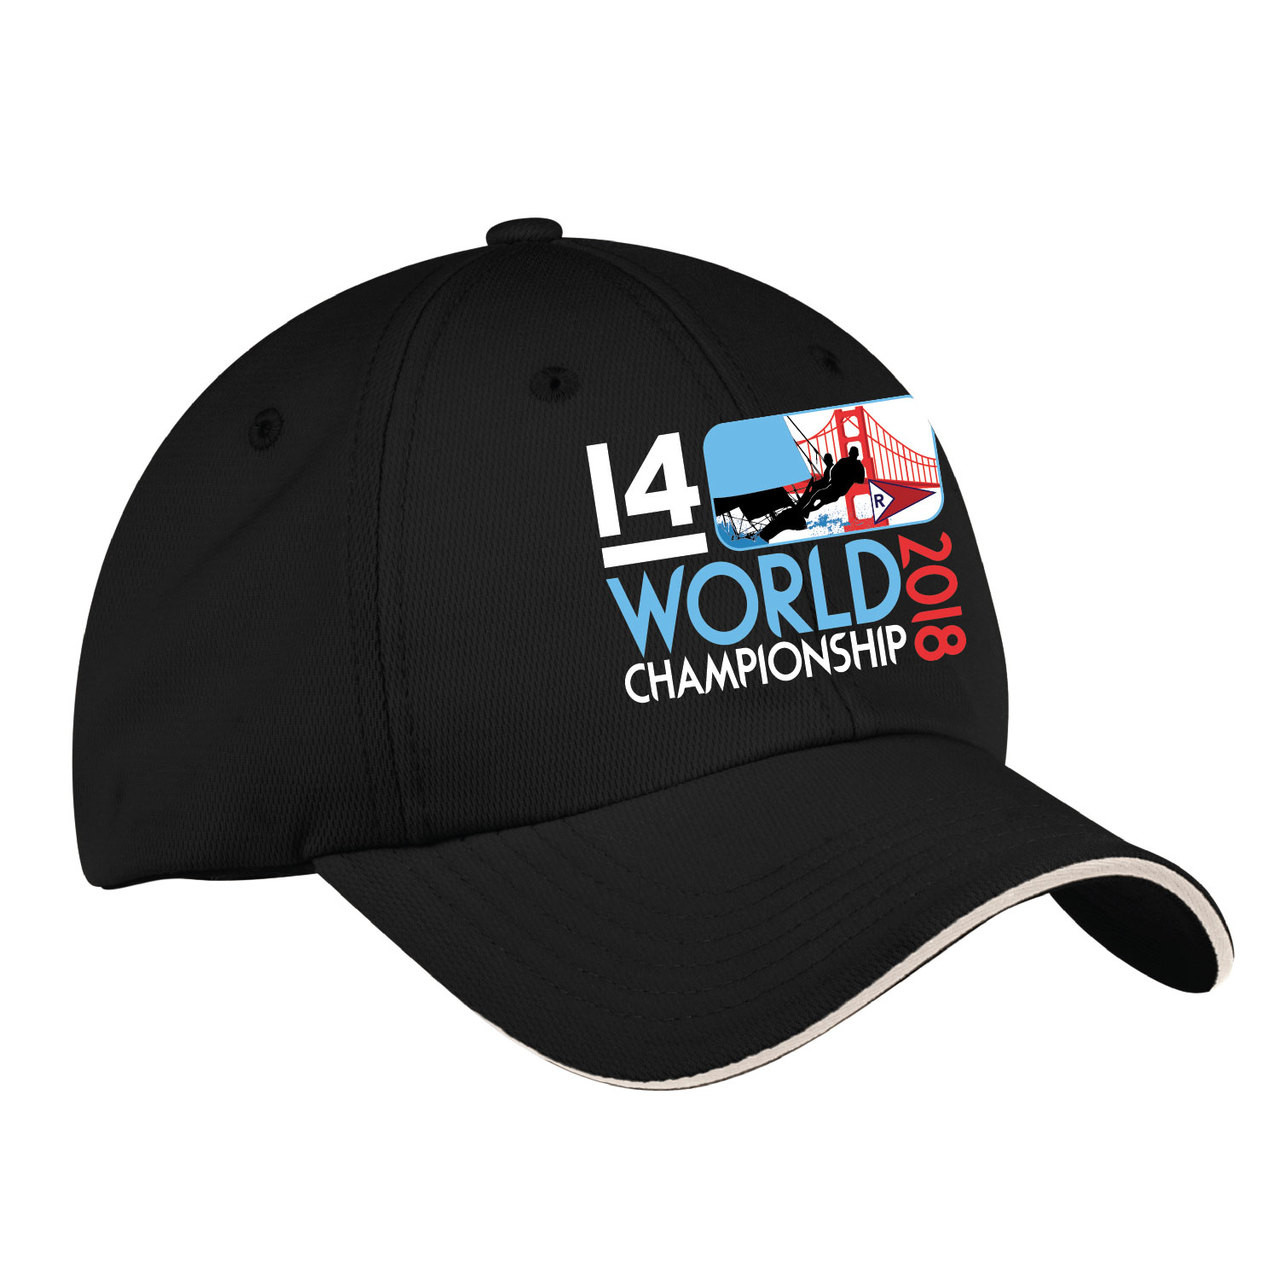 Wonderful Cap World Cup 2018 - Richmond_Yacht_Club_I14_World_Championship_2018-C838_Wicking_Cap-10__60738  Snapshot_422924 .jpg?c\u003d2\u0026imbypass\u003don